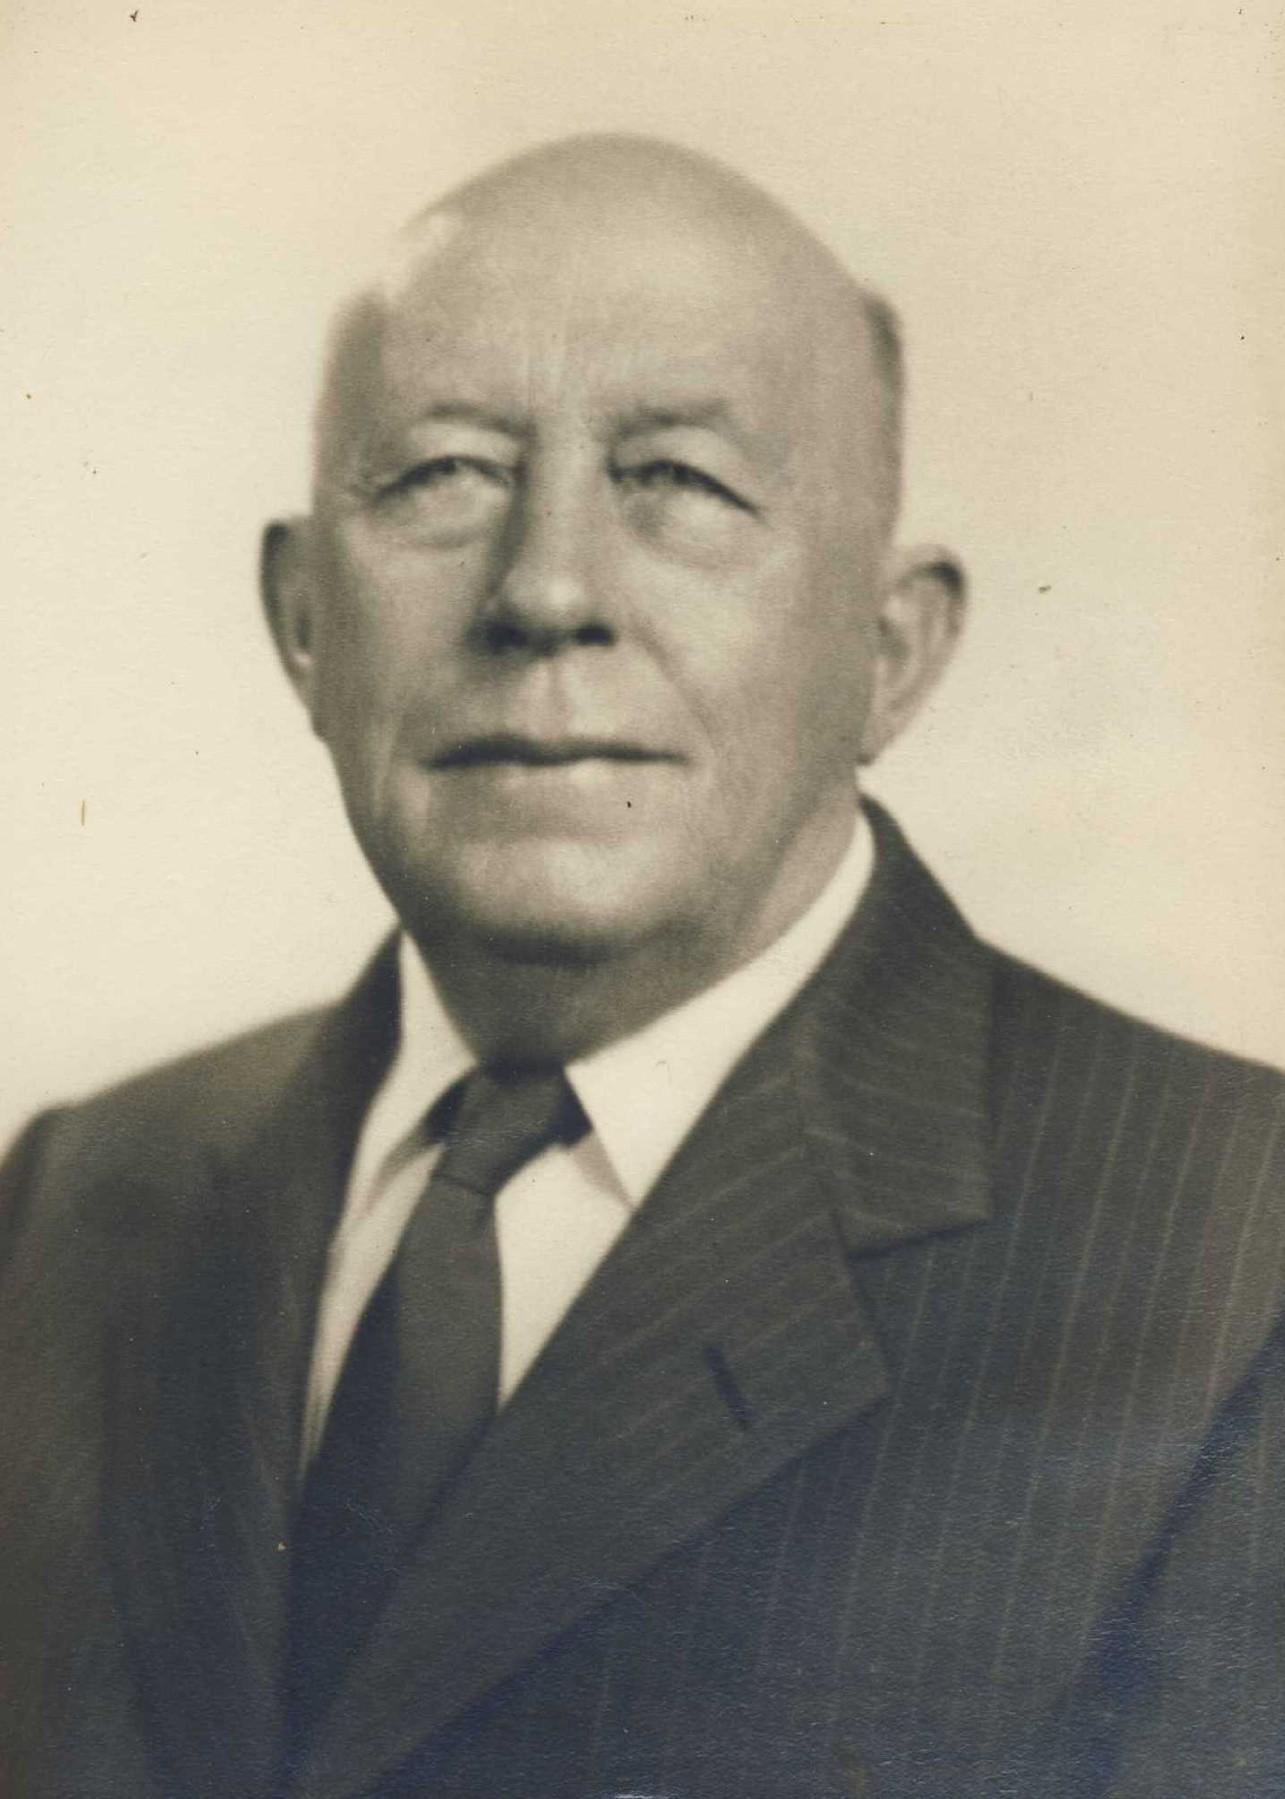 100th Anniversary of Funeral Home Obituary - Brunswick, GA